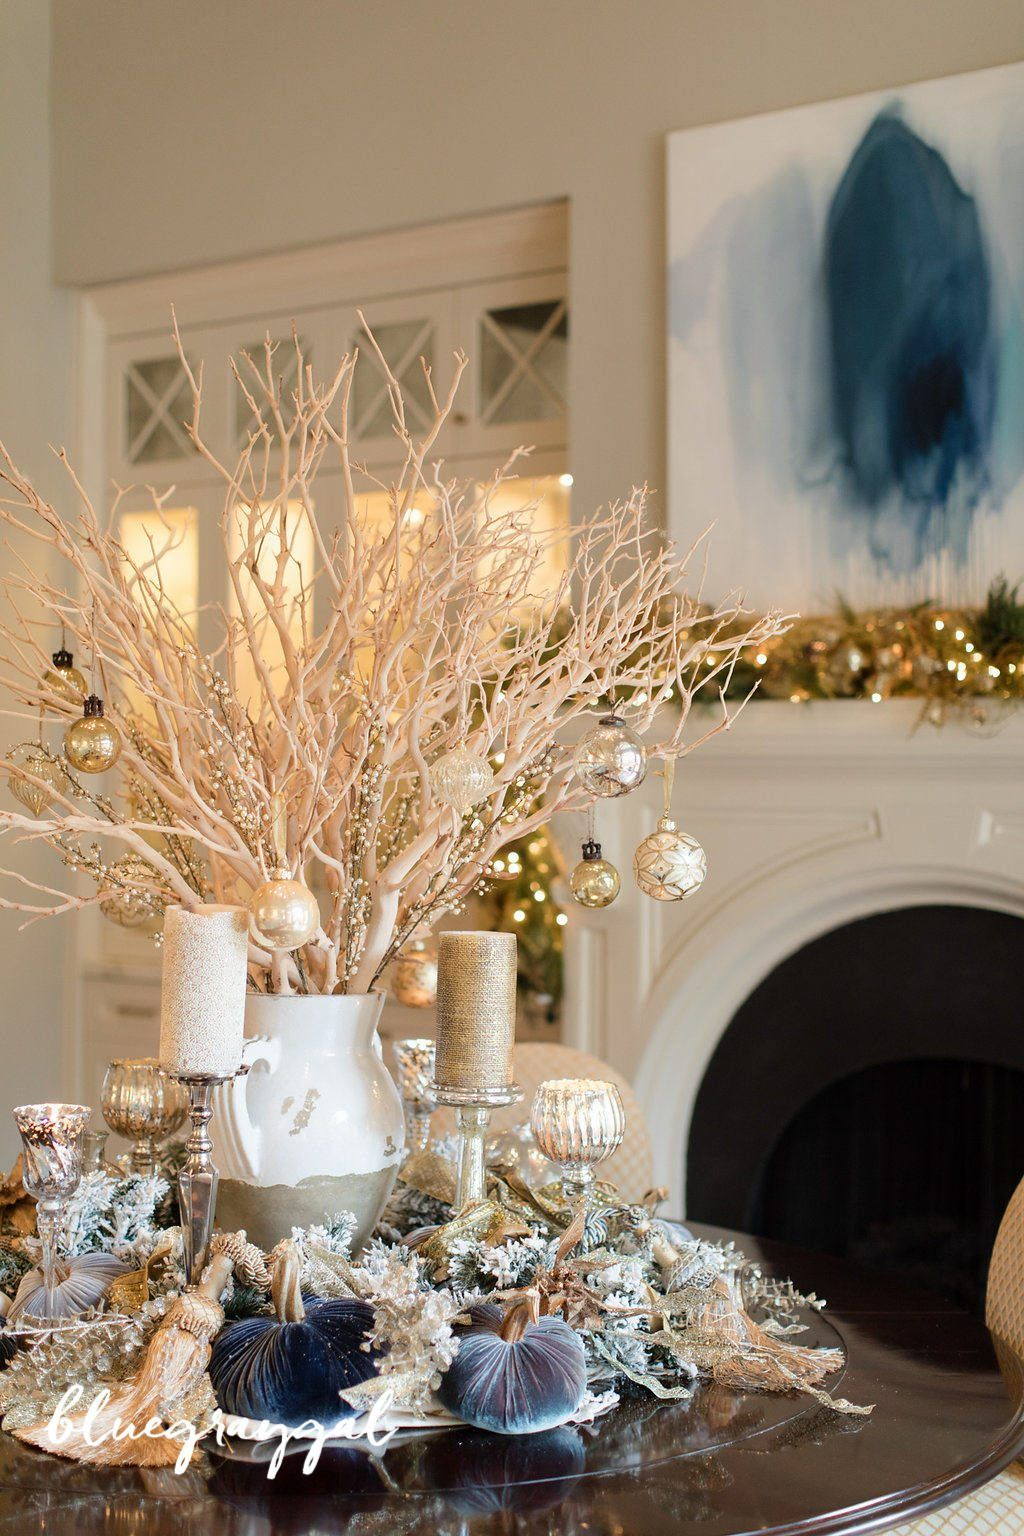 Easy Dining Room Centerpiece Using Manzanita Branches